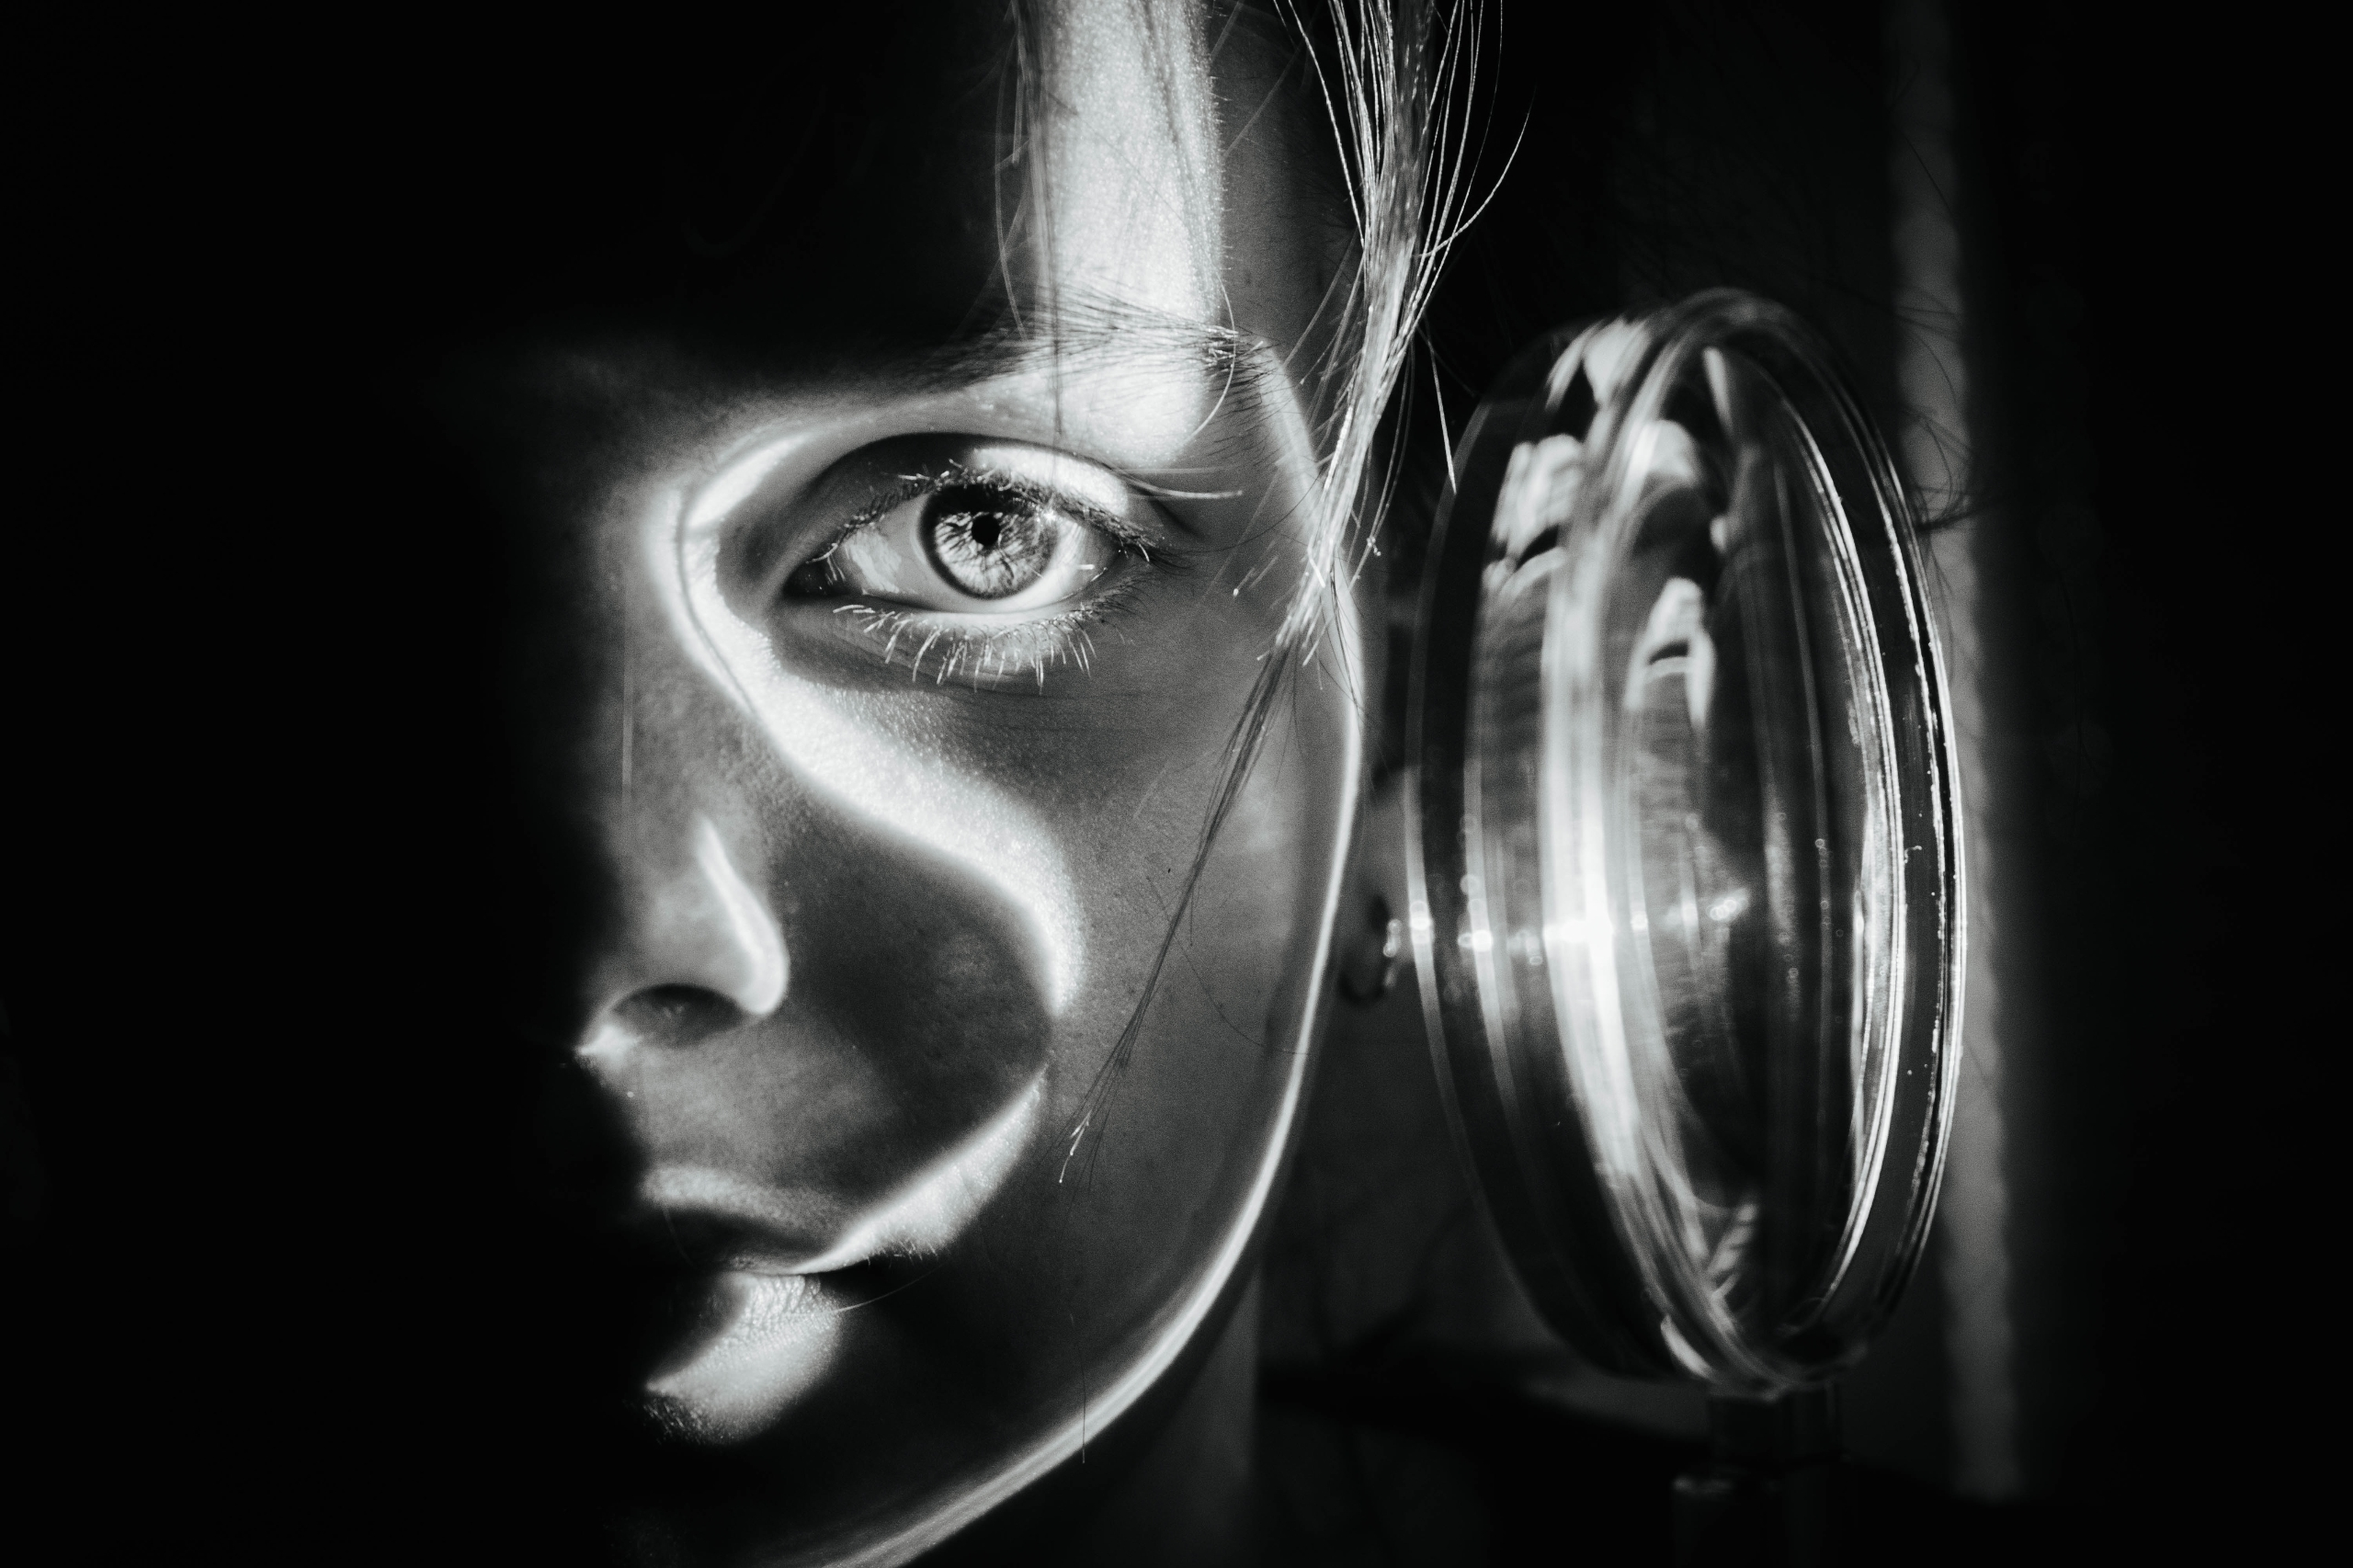 MAGNIFICENT shaping light magni - brecht_vanhoutte | ello